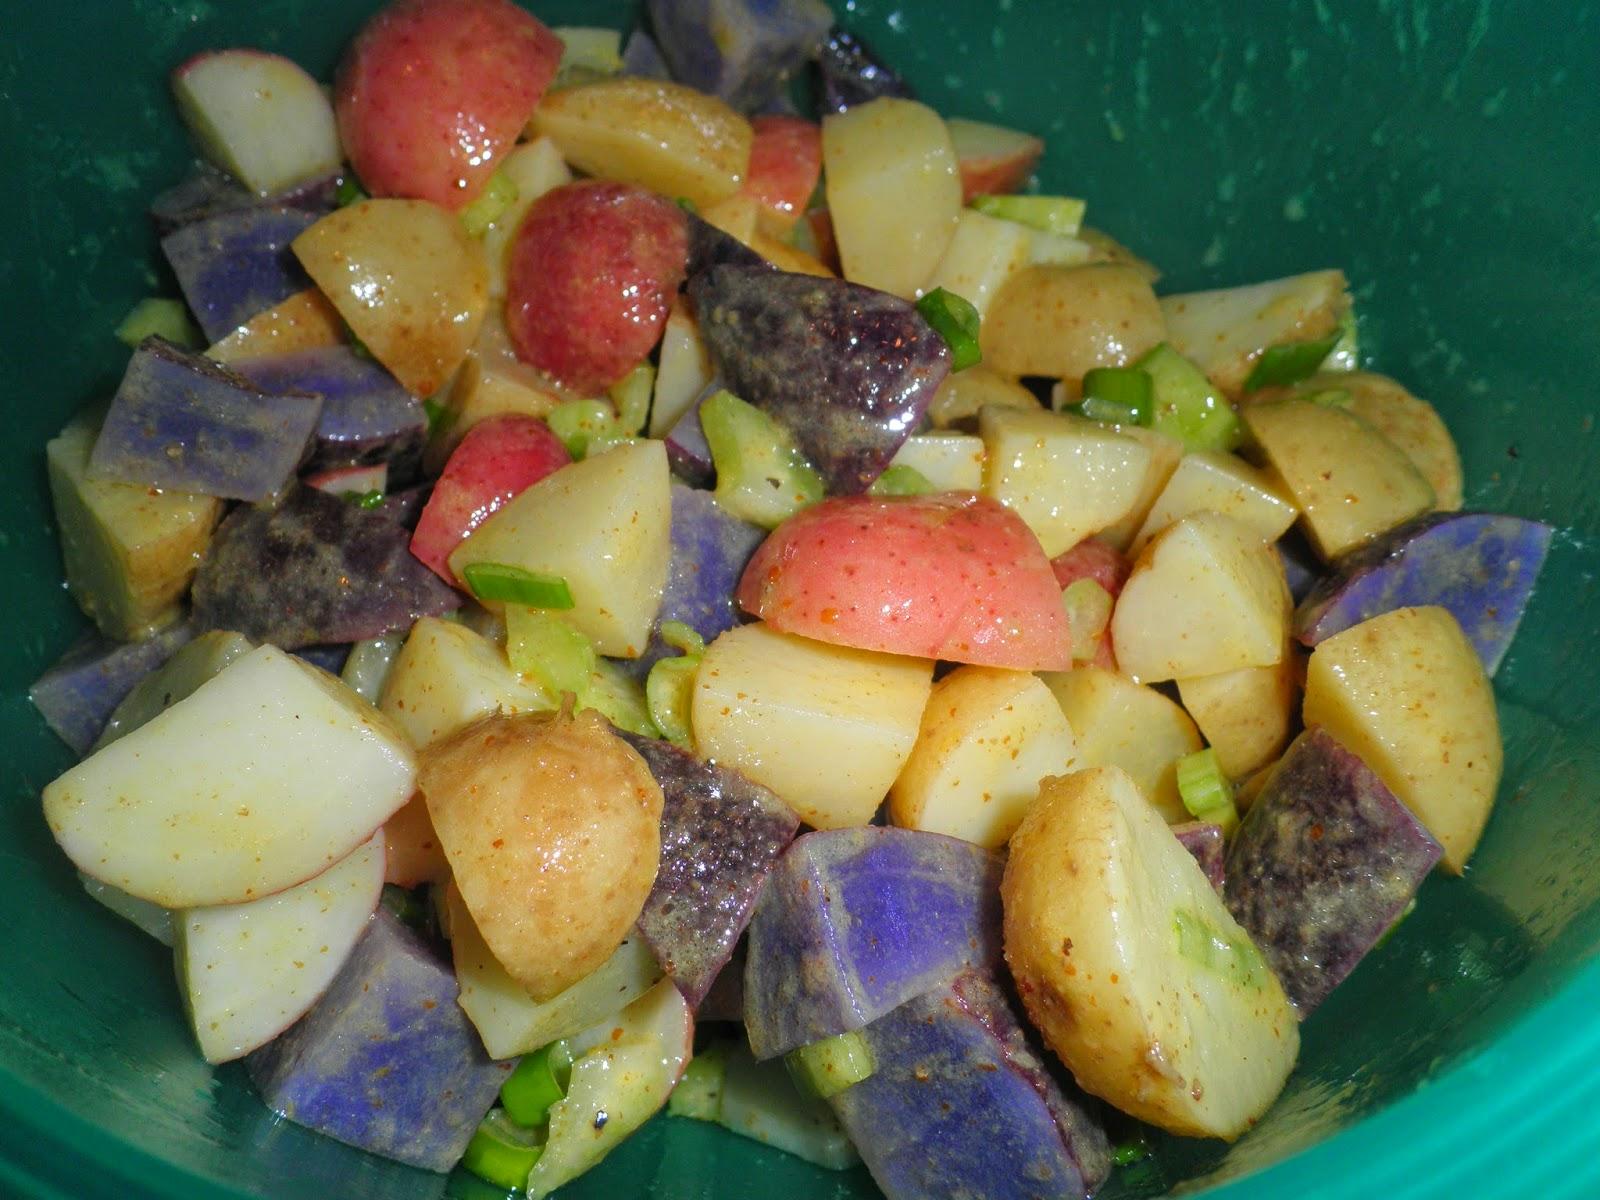 Secrets from the Cookie Princess: Patriotic Potato Salad